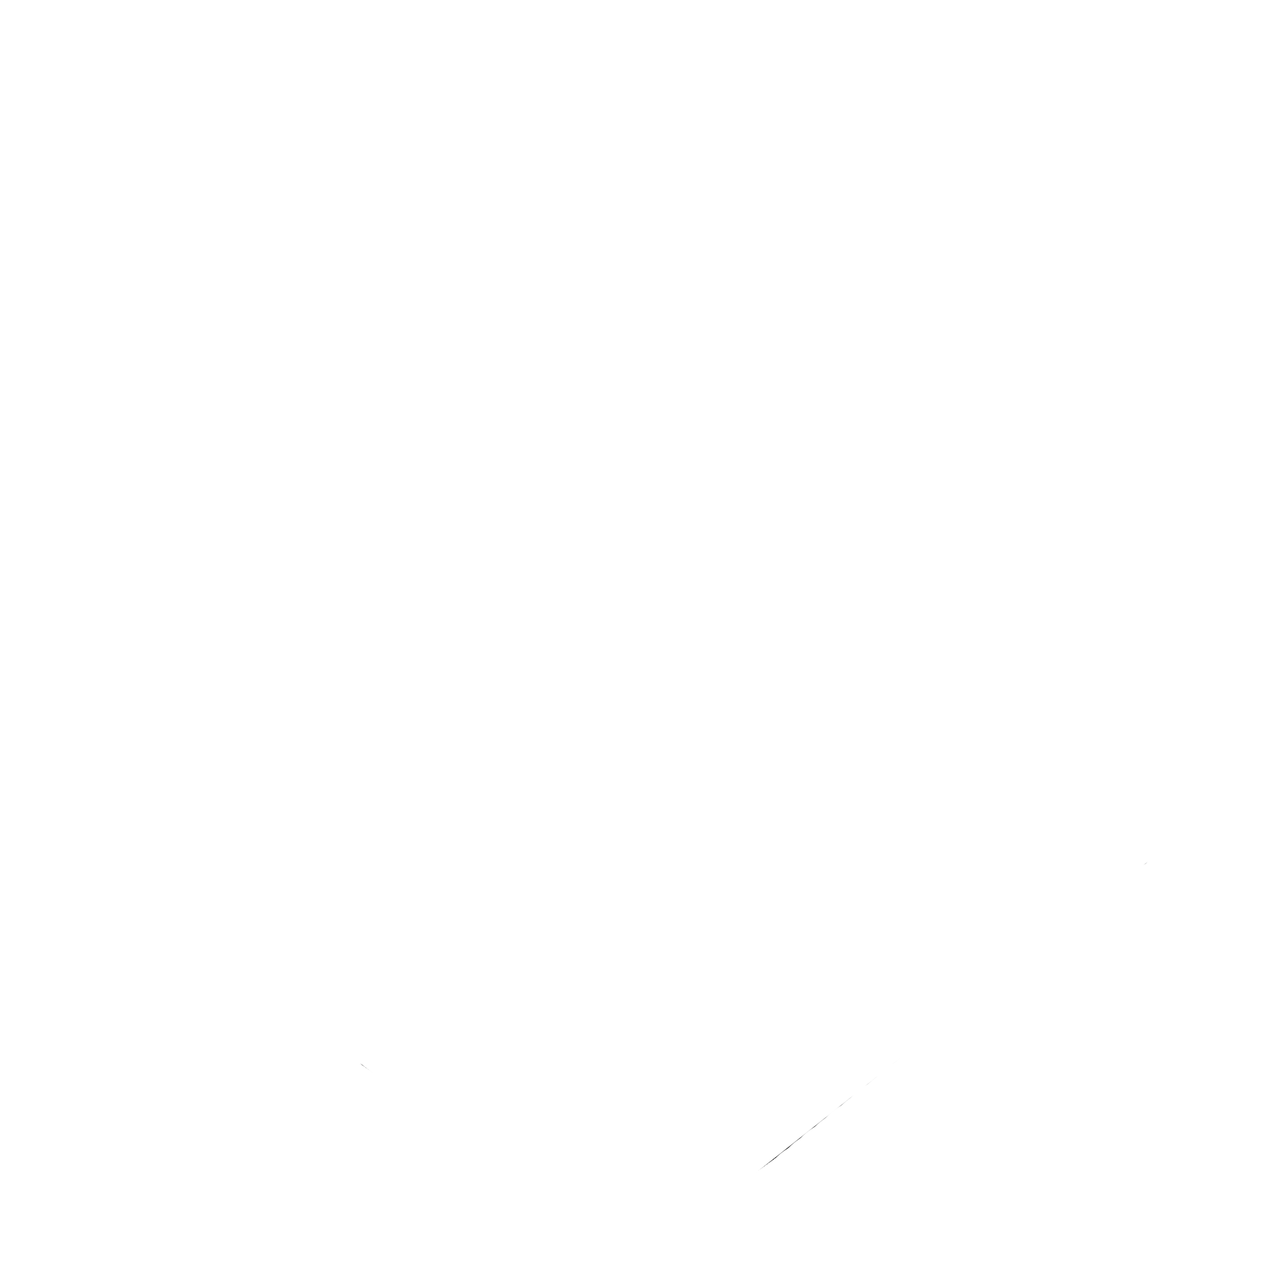 servants heart entertainment idaho falls id